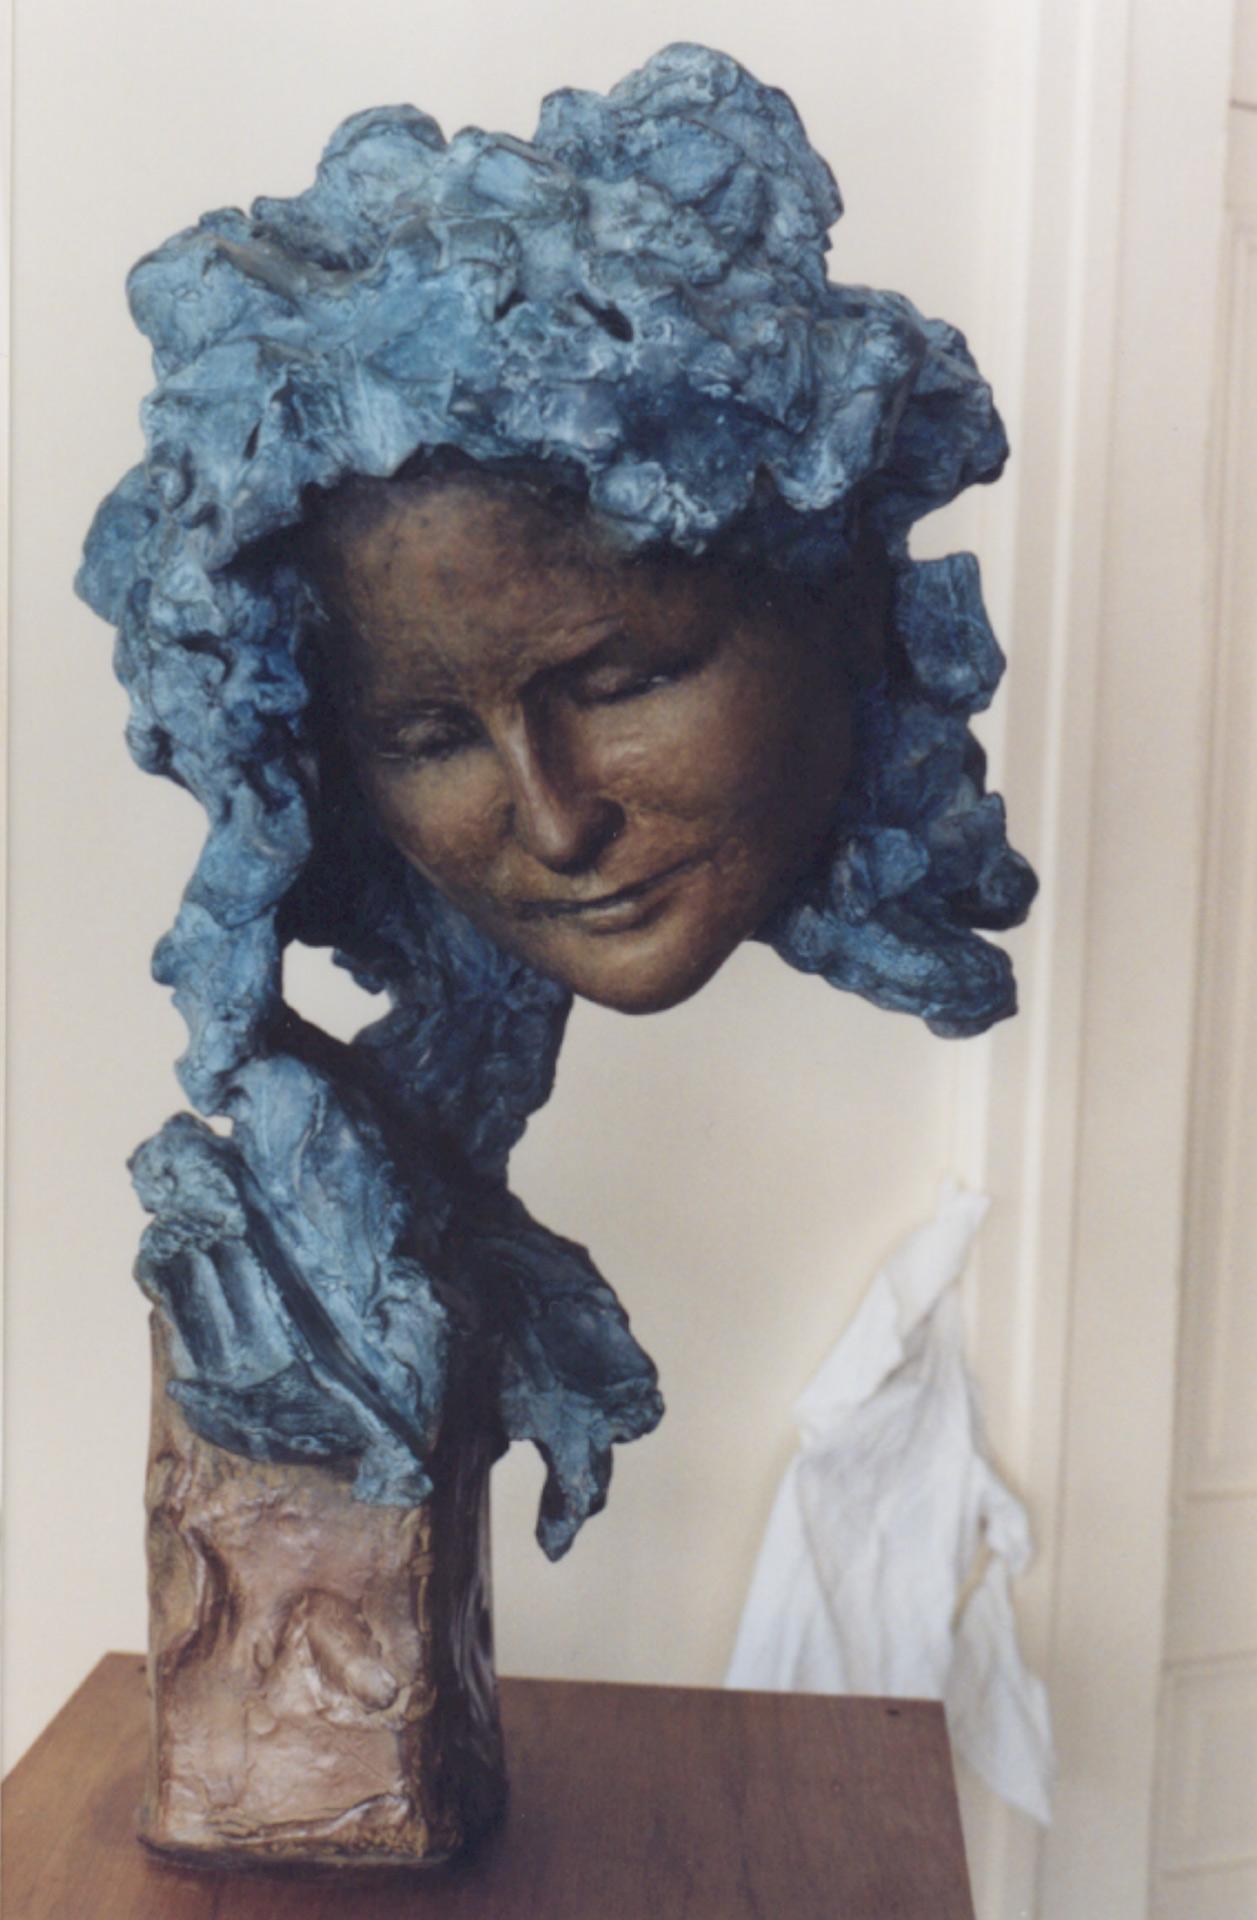 La-Muse-Dina-Vierny-Bronzepolychromé-H73cm-RogerVene-3